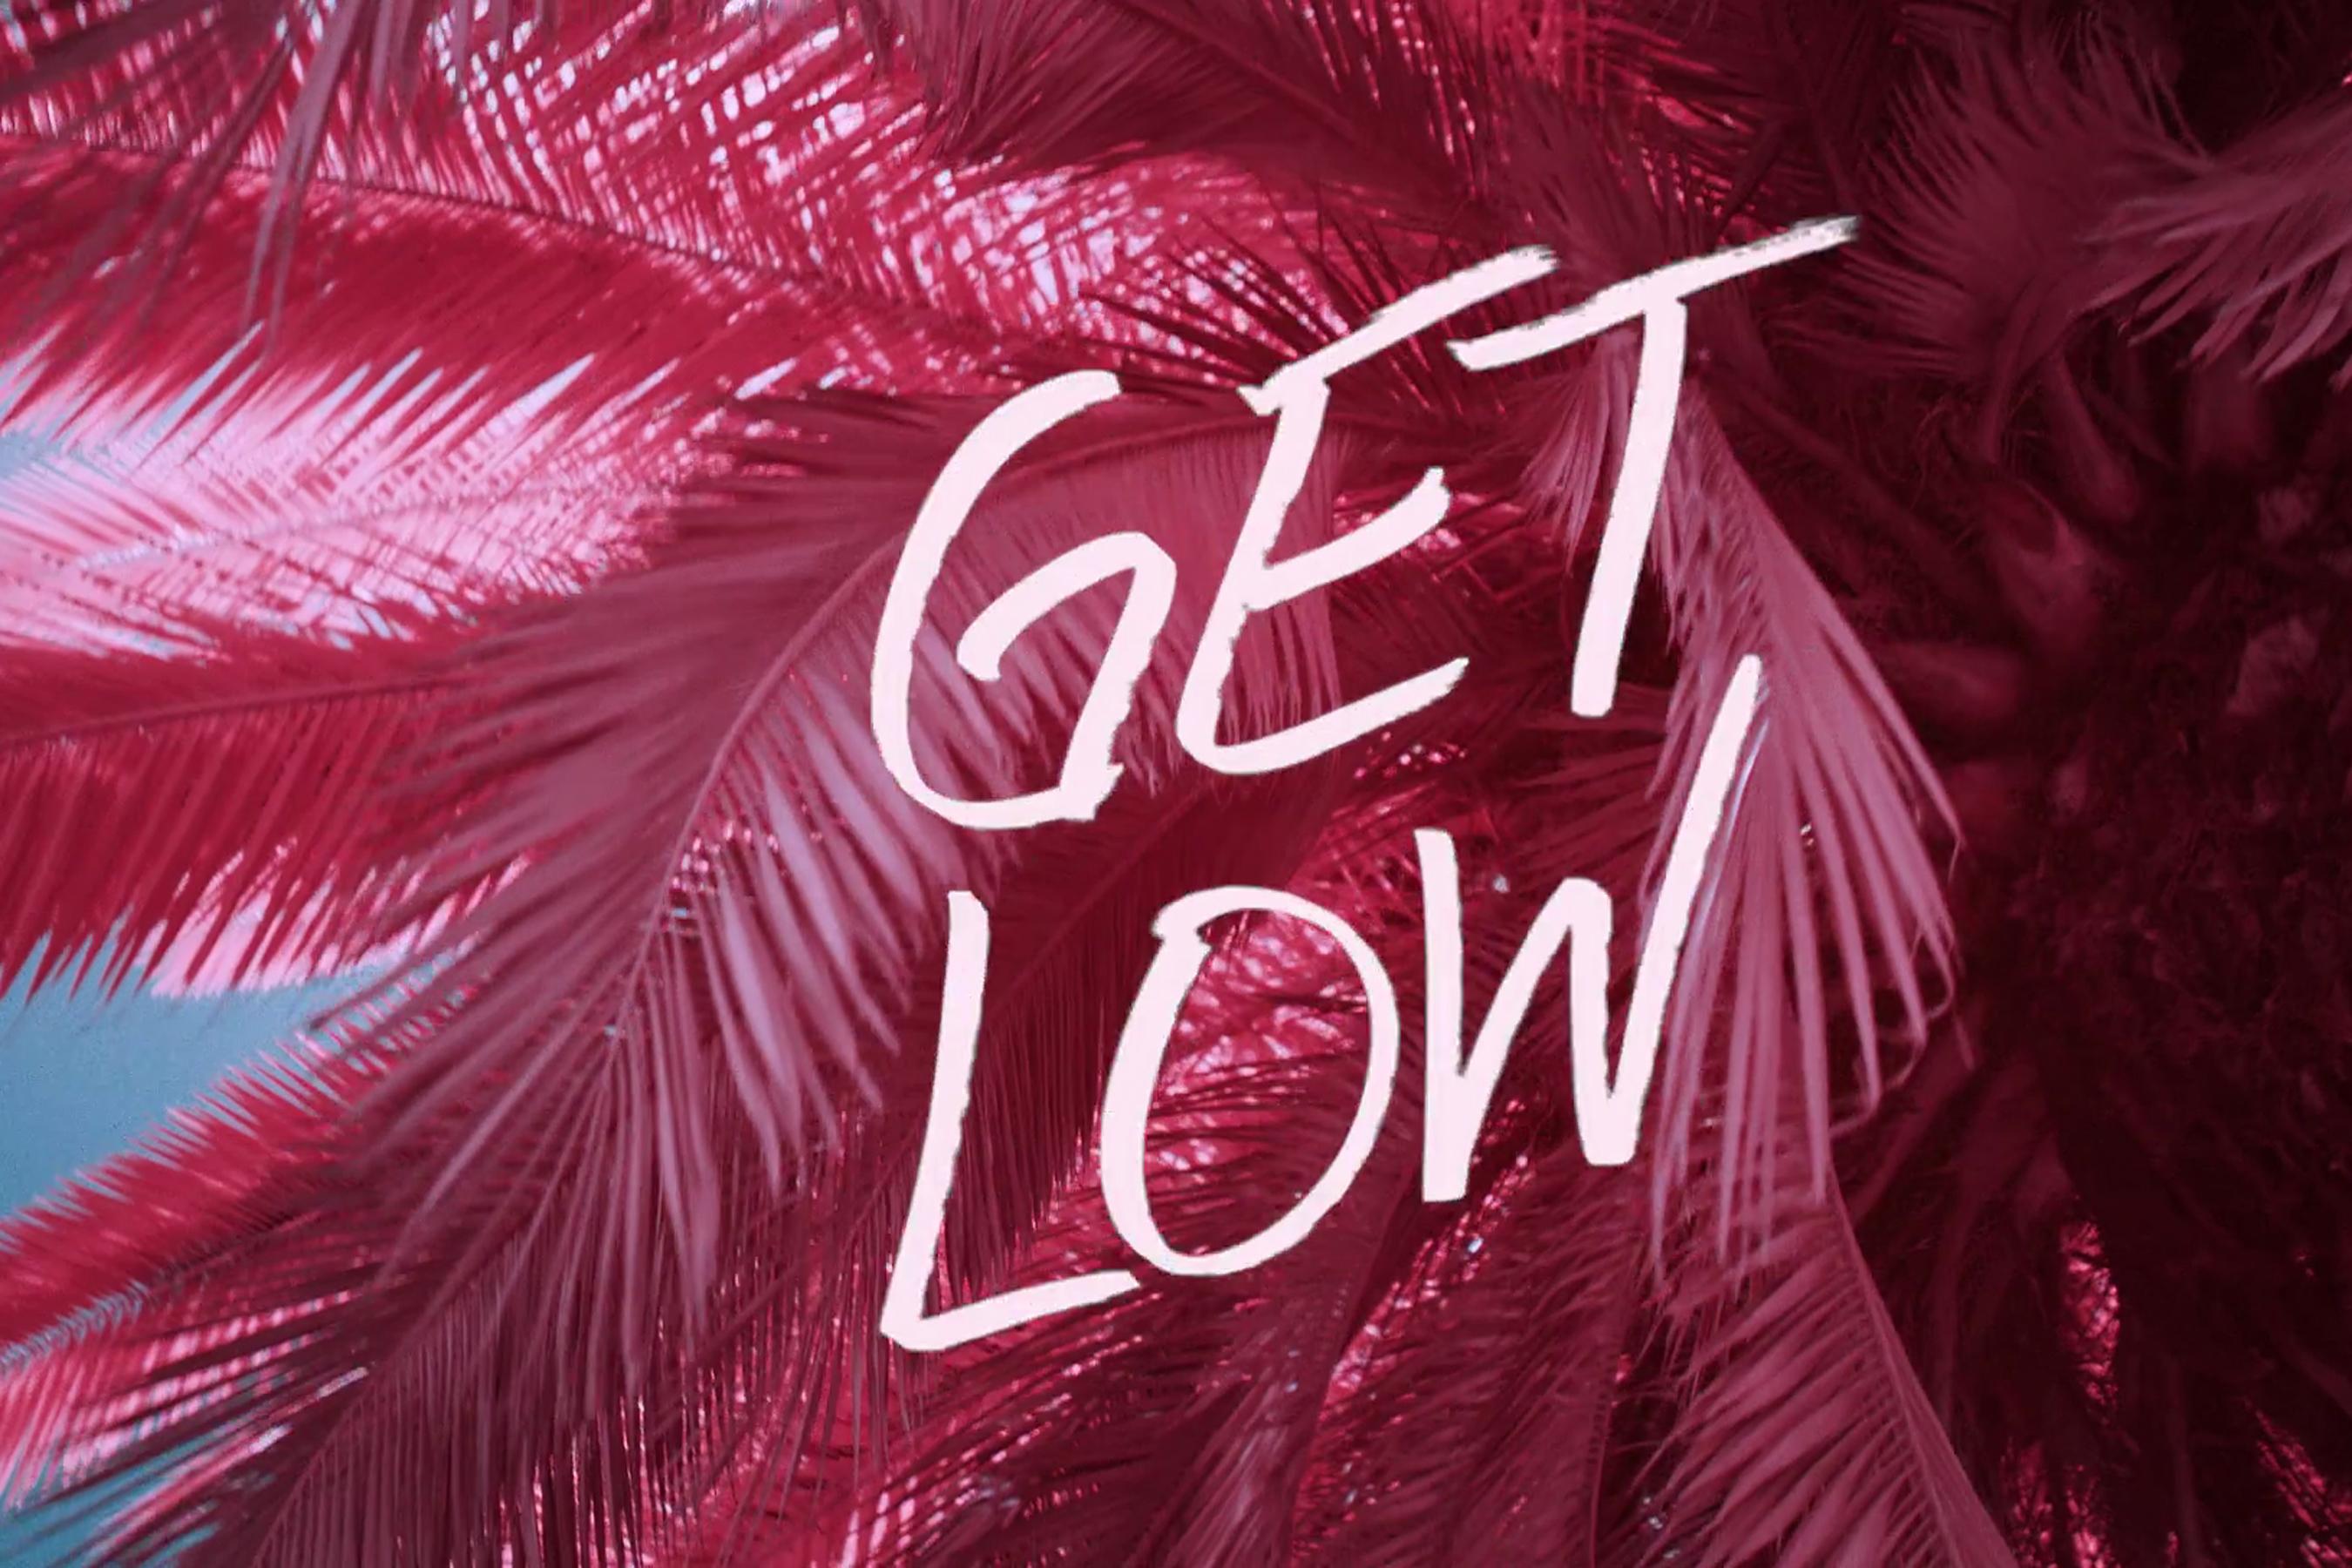 Zedd, Get Low feat. Liam Payne (Audio-Video)